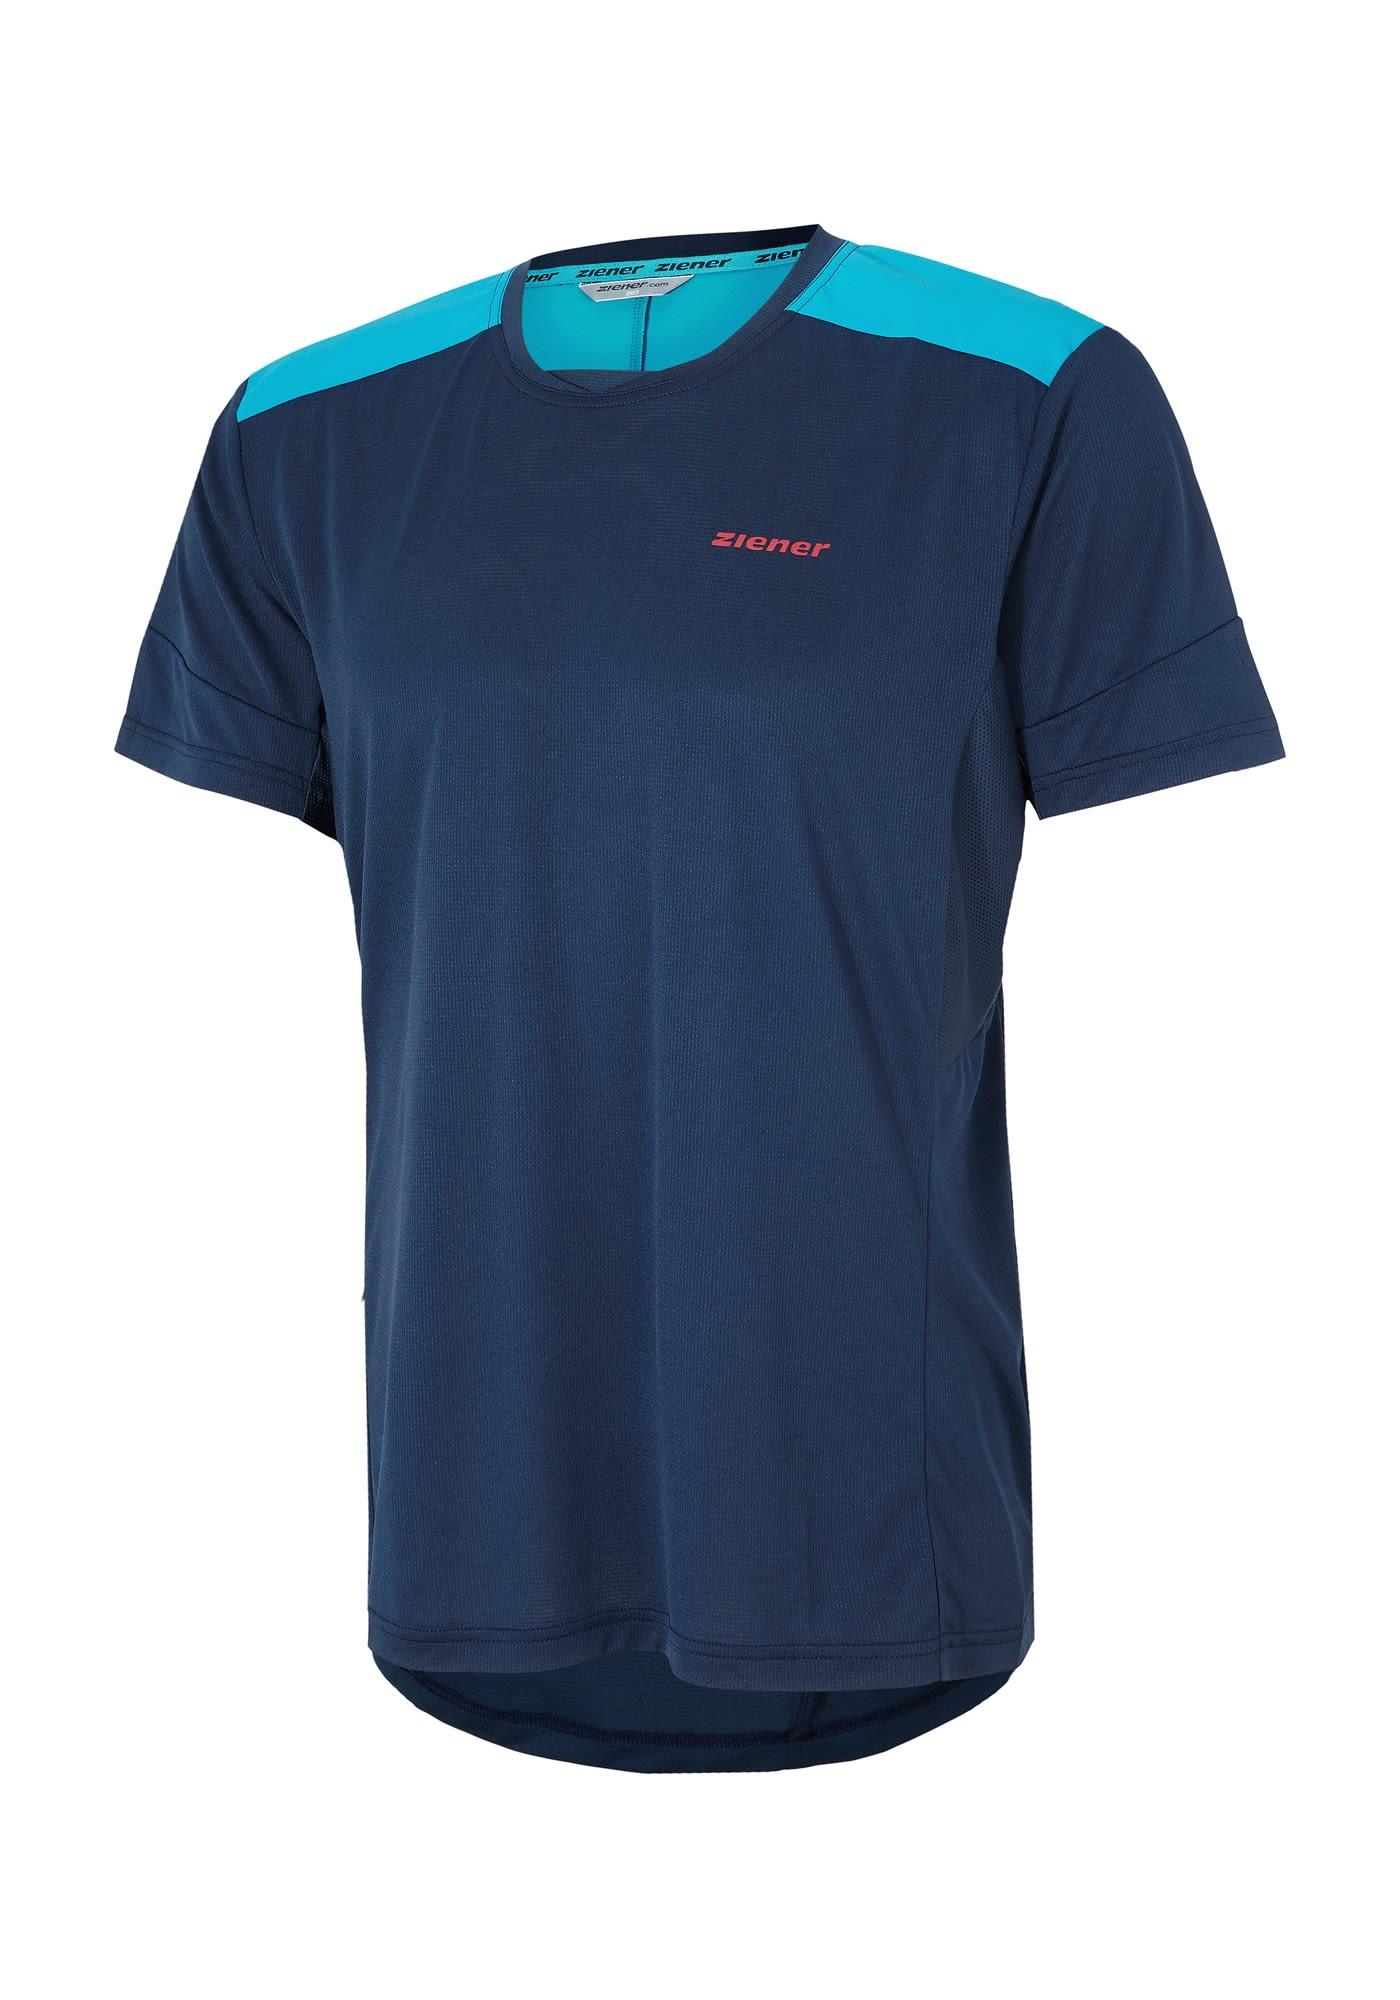 Ziener Nevyo Blau, Male Kurzarm-Shirt, 48